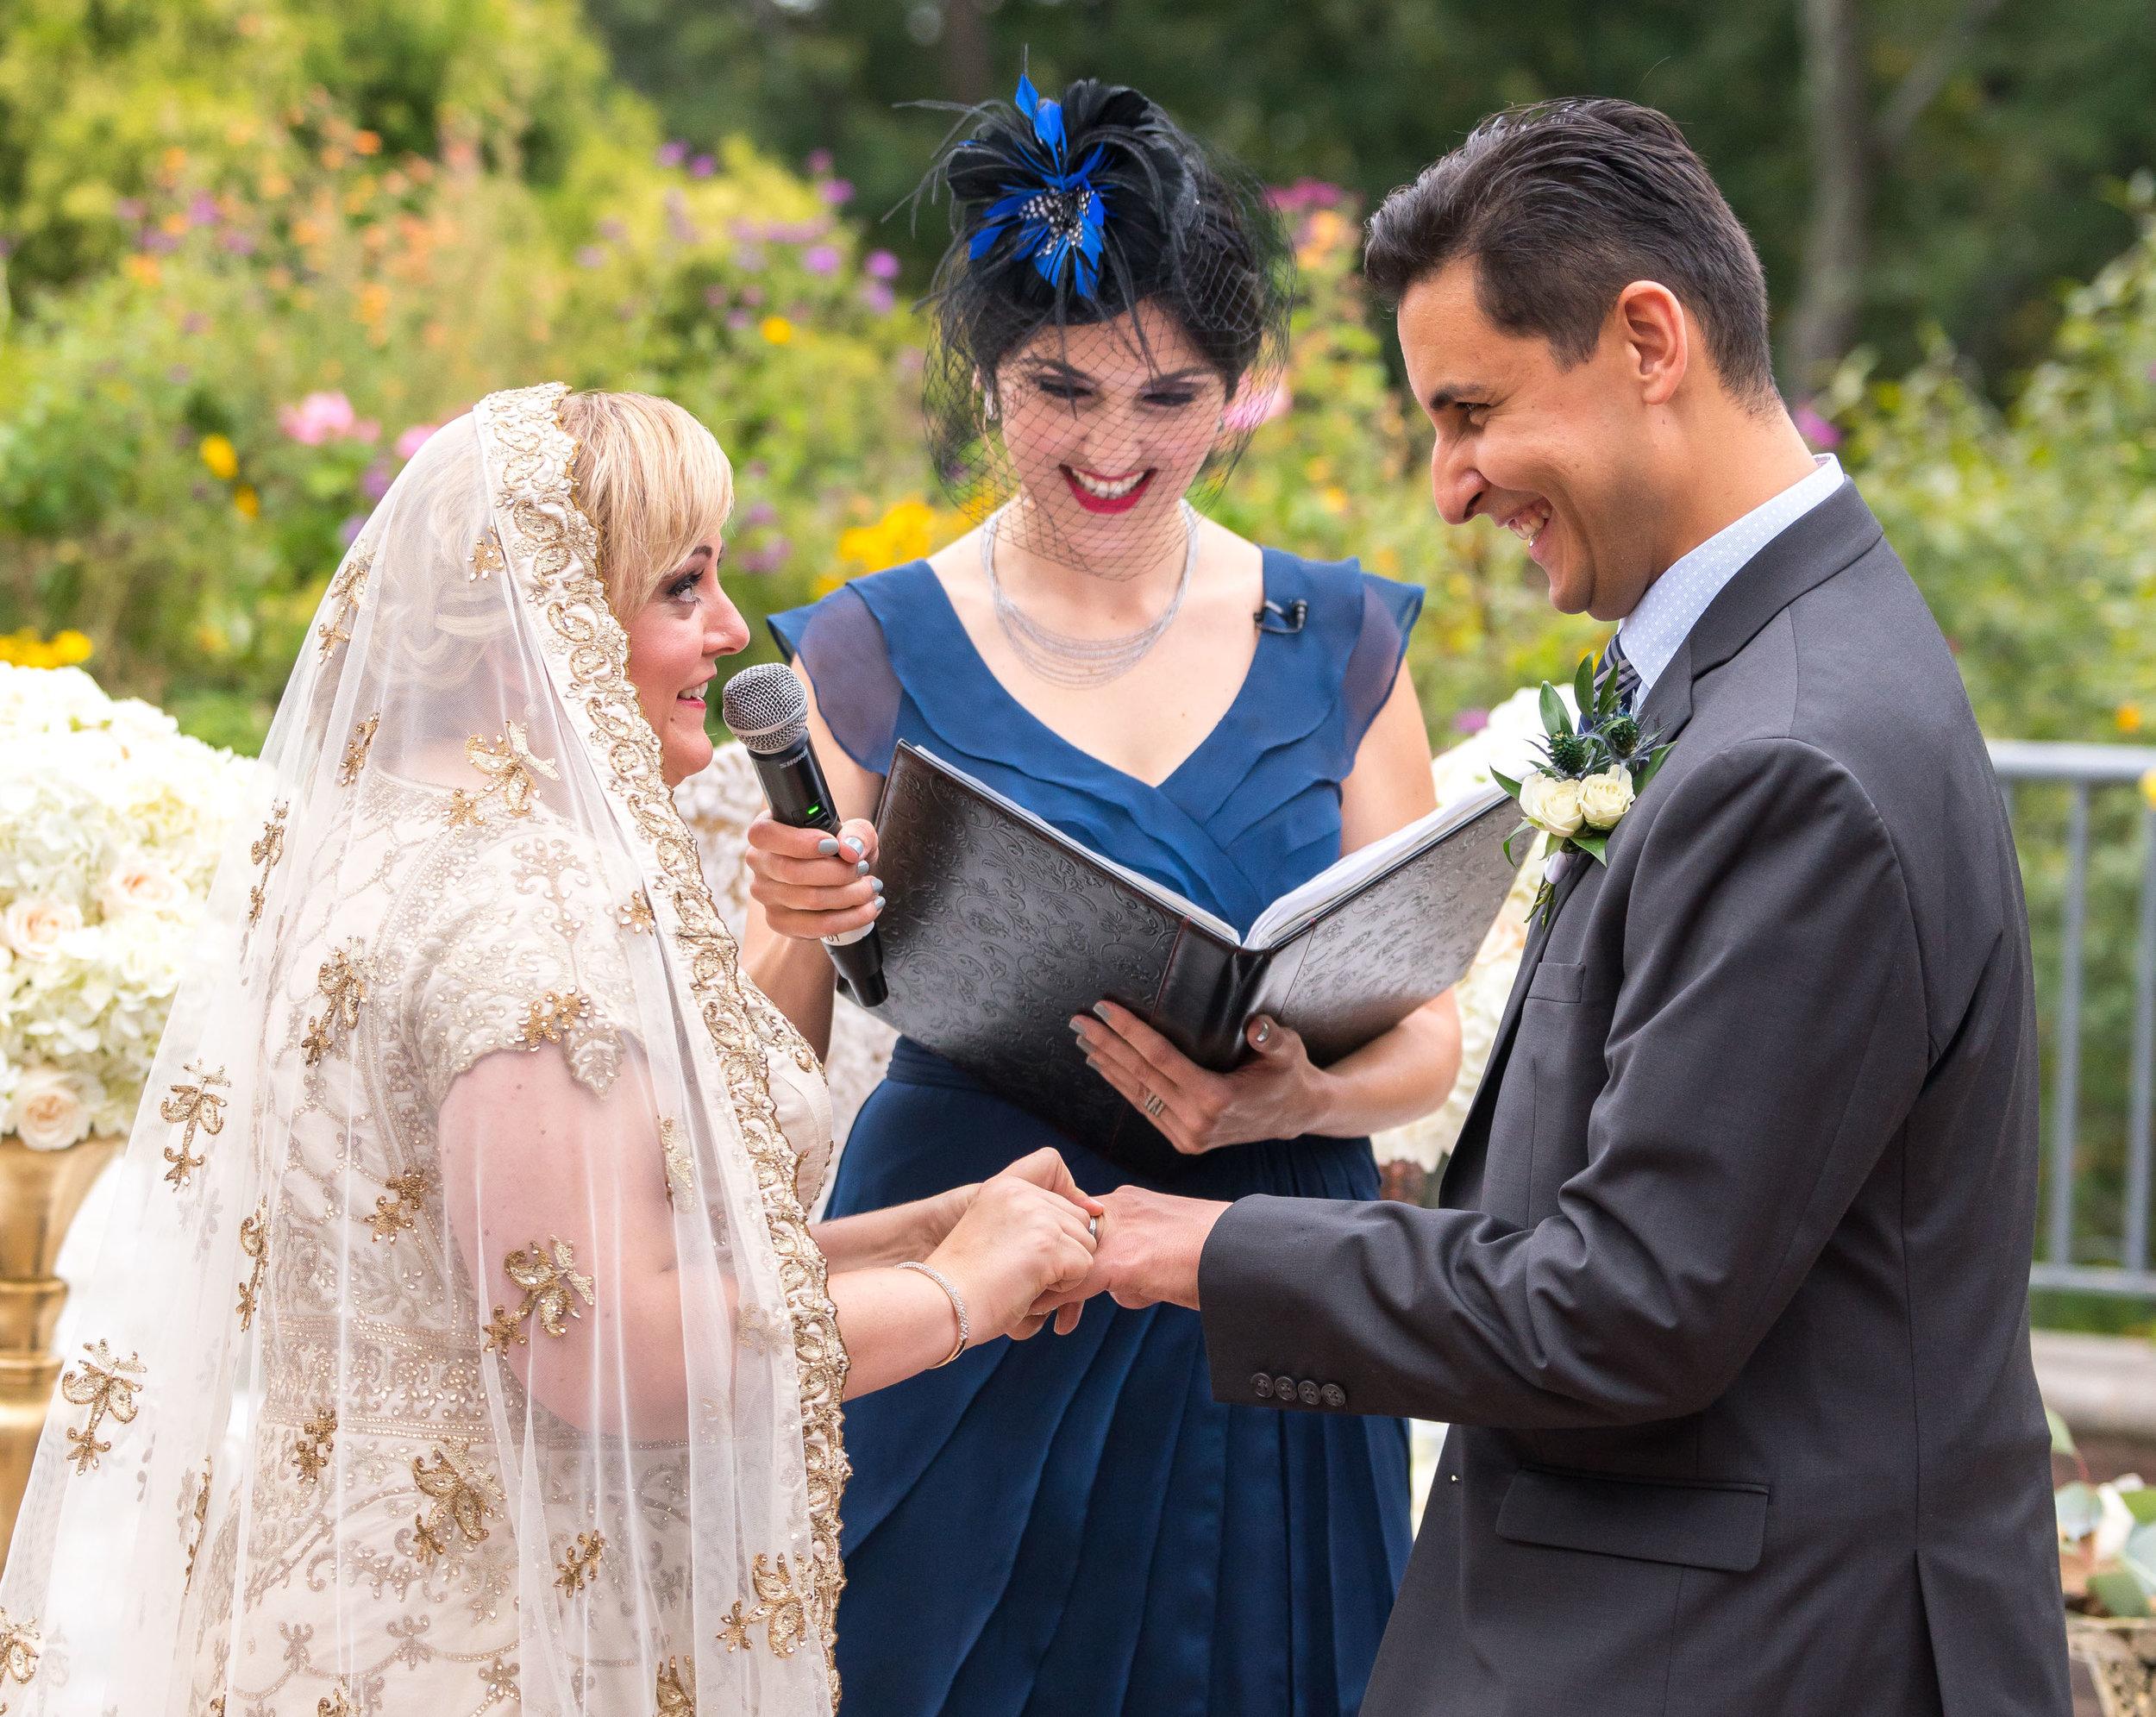 Wedding ceremony at Meadowlark Botanical Gardens